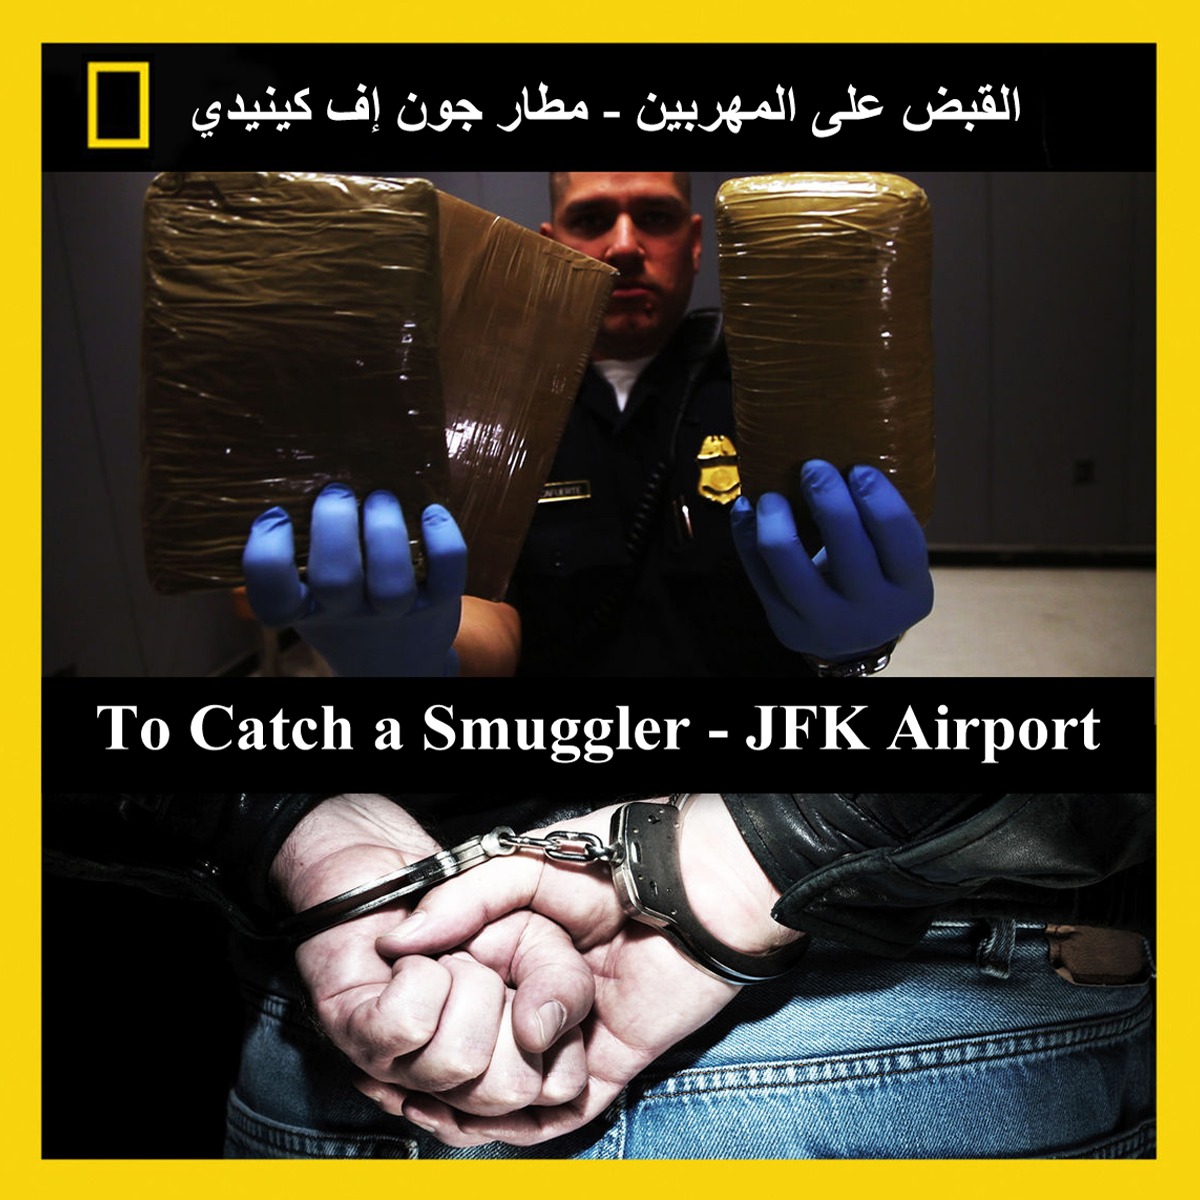 HDTV-1080p | القبض على المهربين: مطار جون إف كينيدي - تهريب الهيروين -- Seeders: 1 -- Leechers: 0